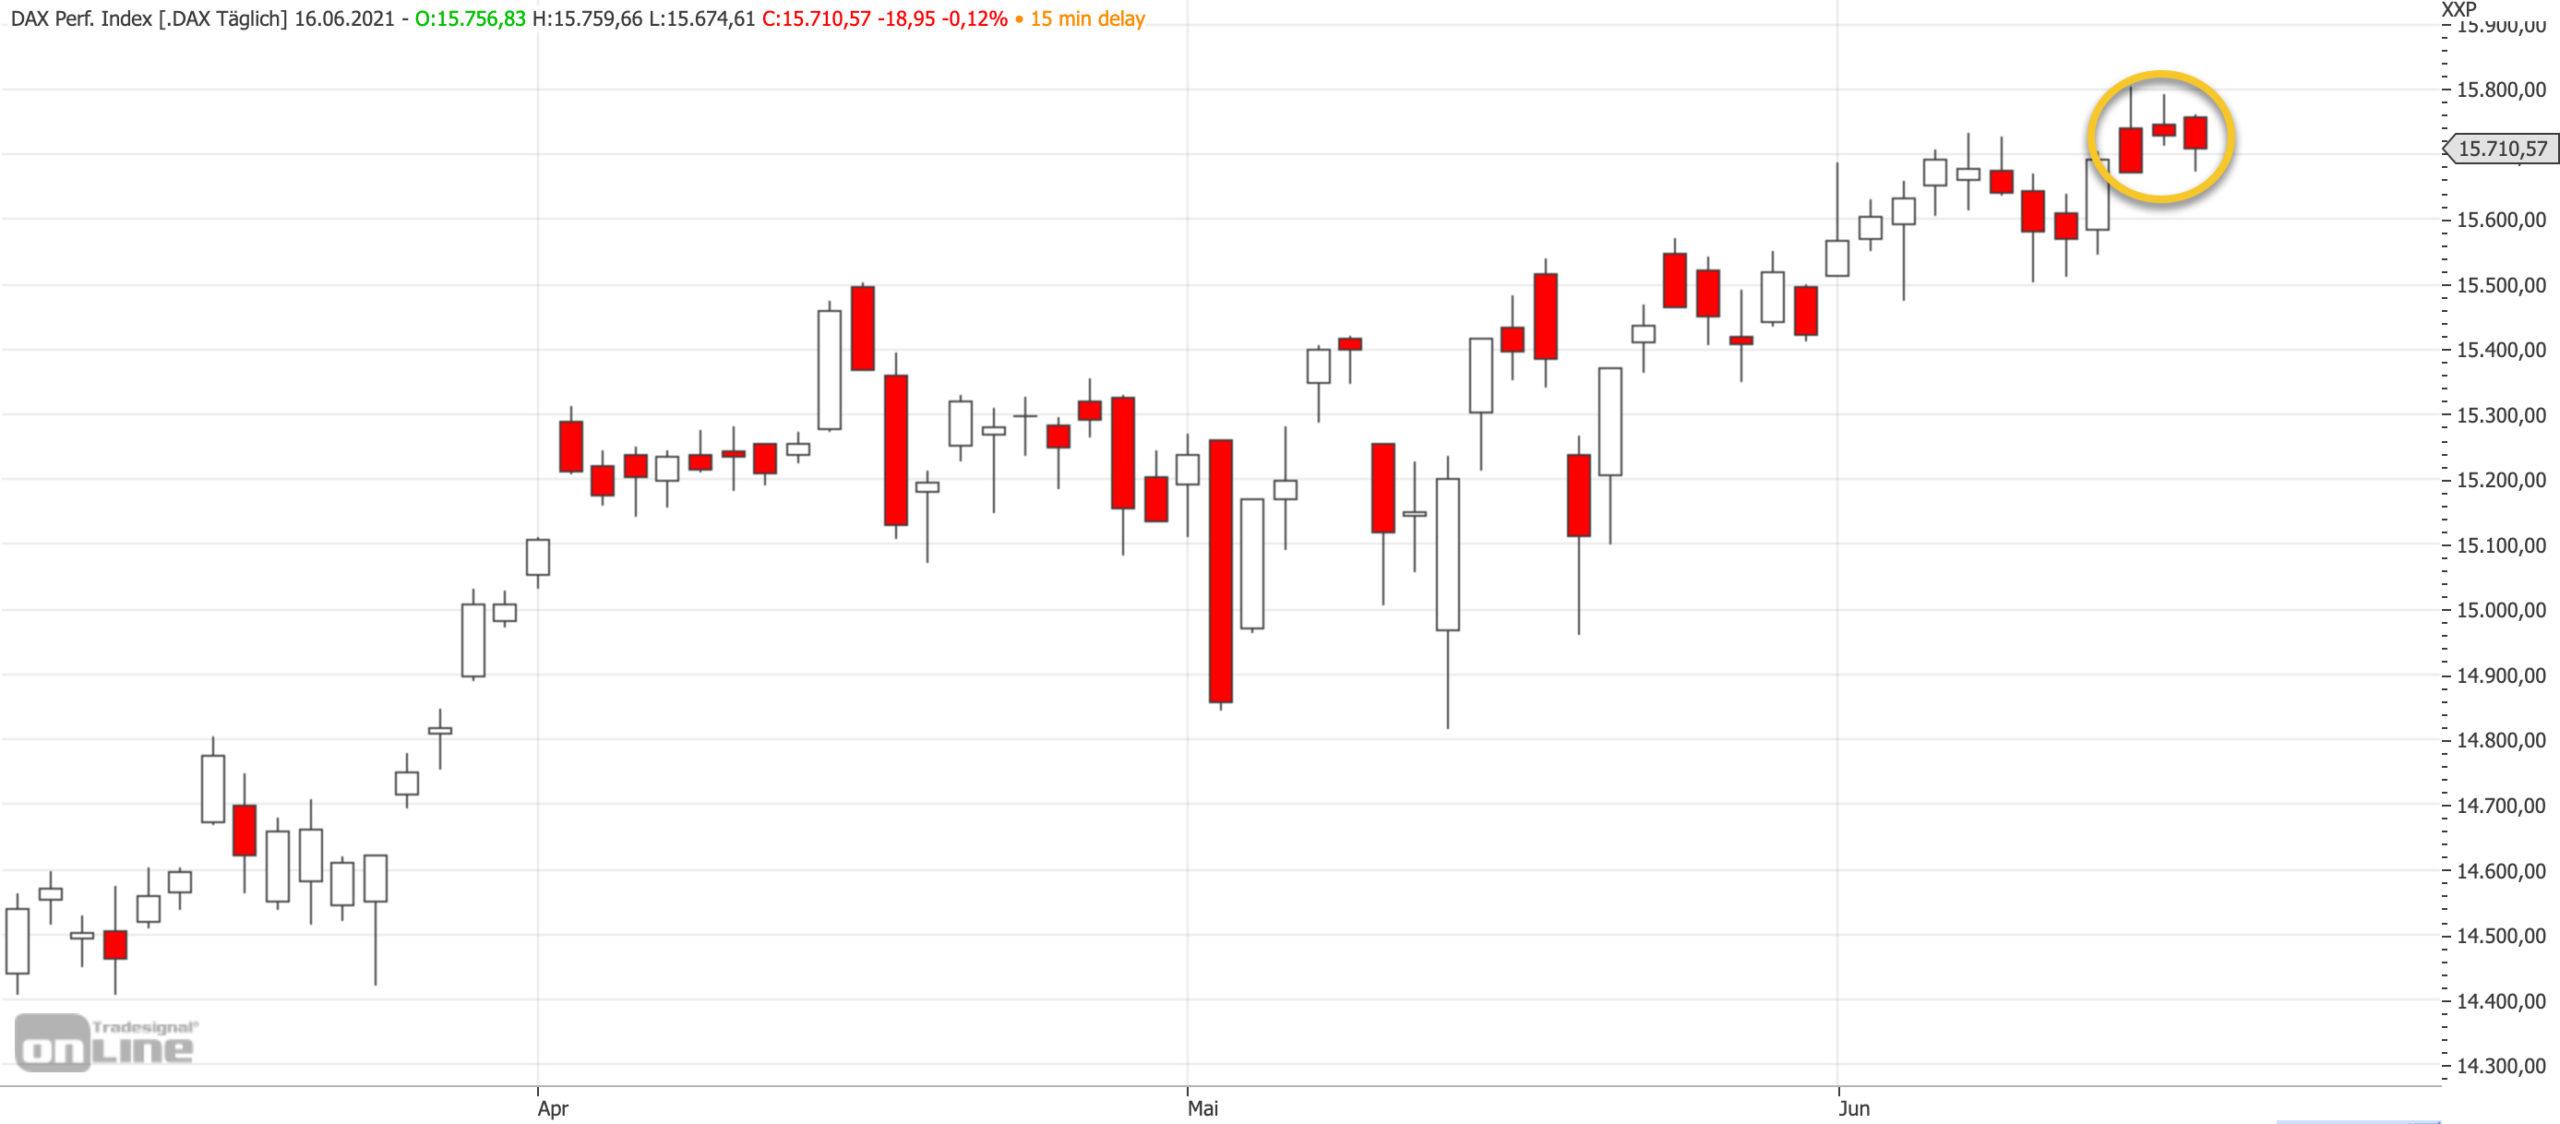 Mittelfristiger DAX-Chart am 16.06.2021